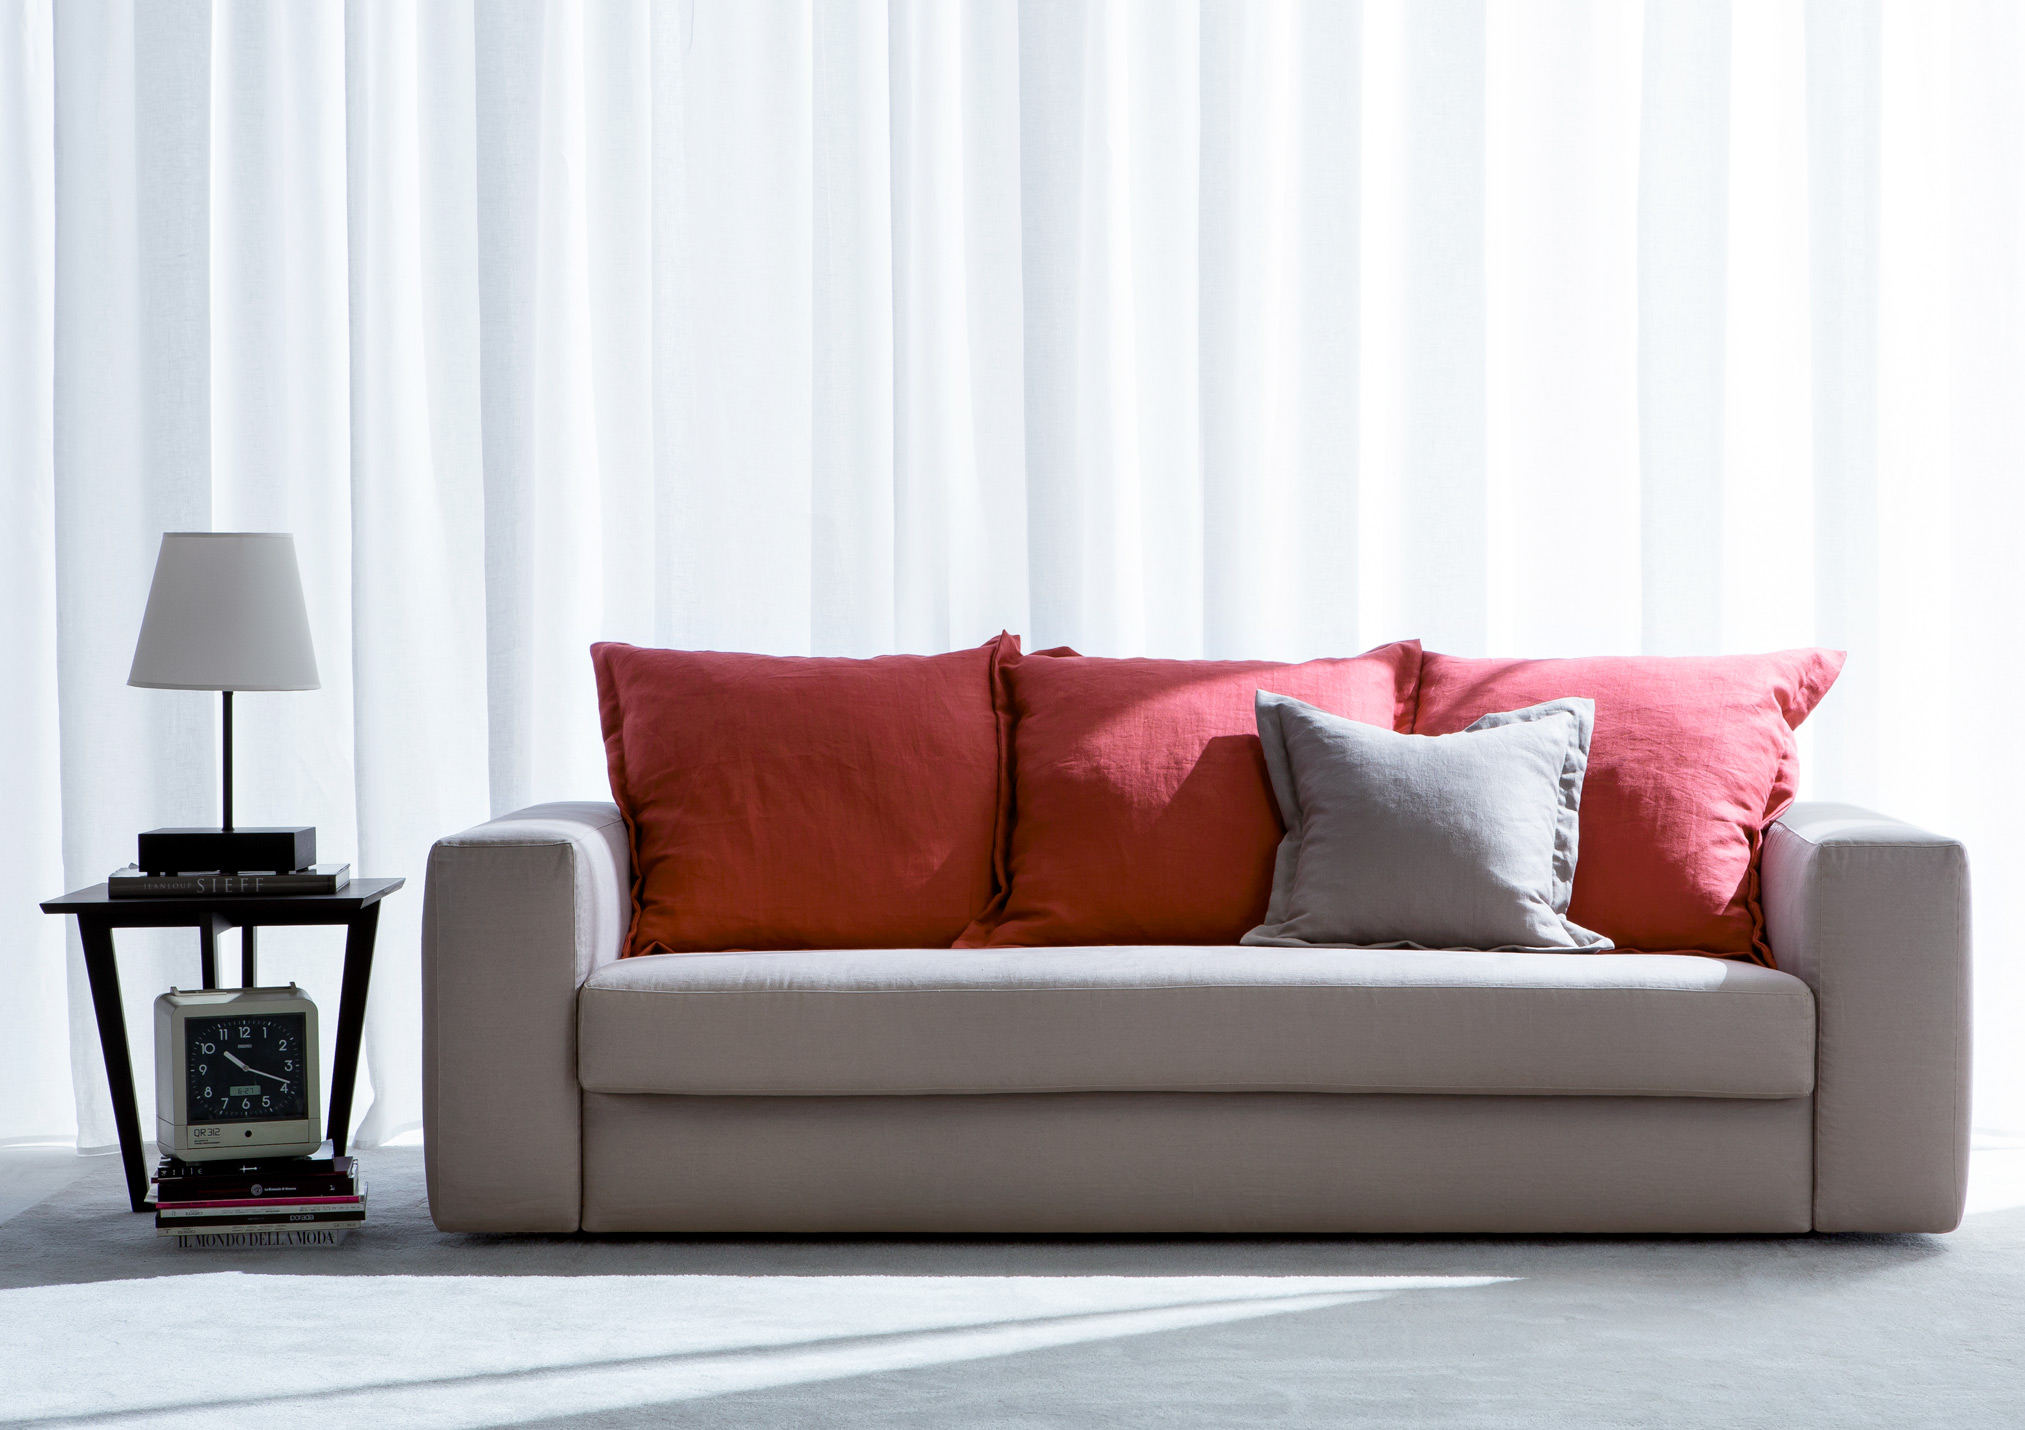 berto canapè-lit